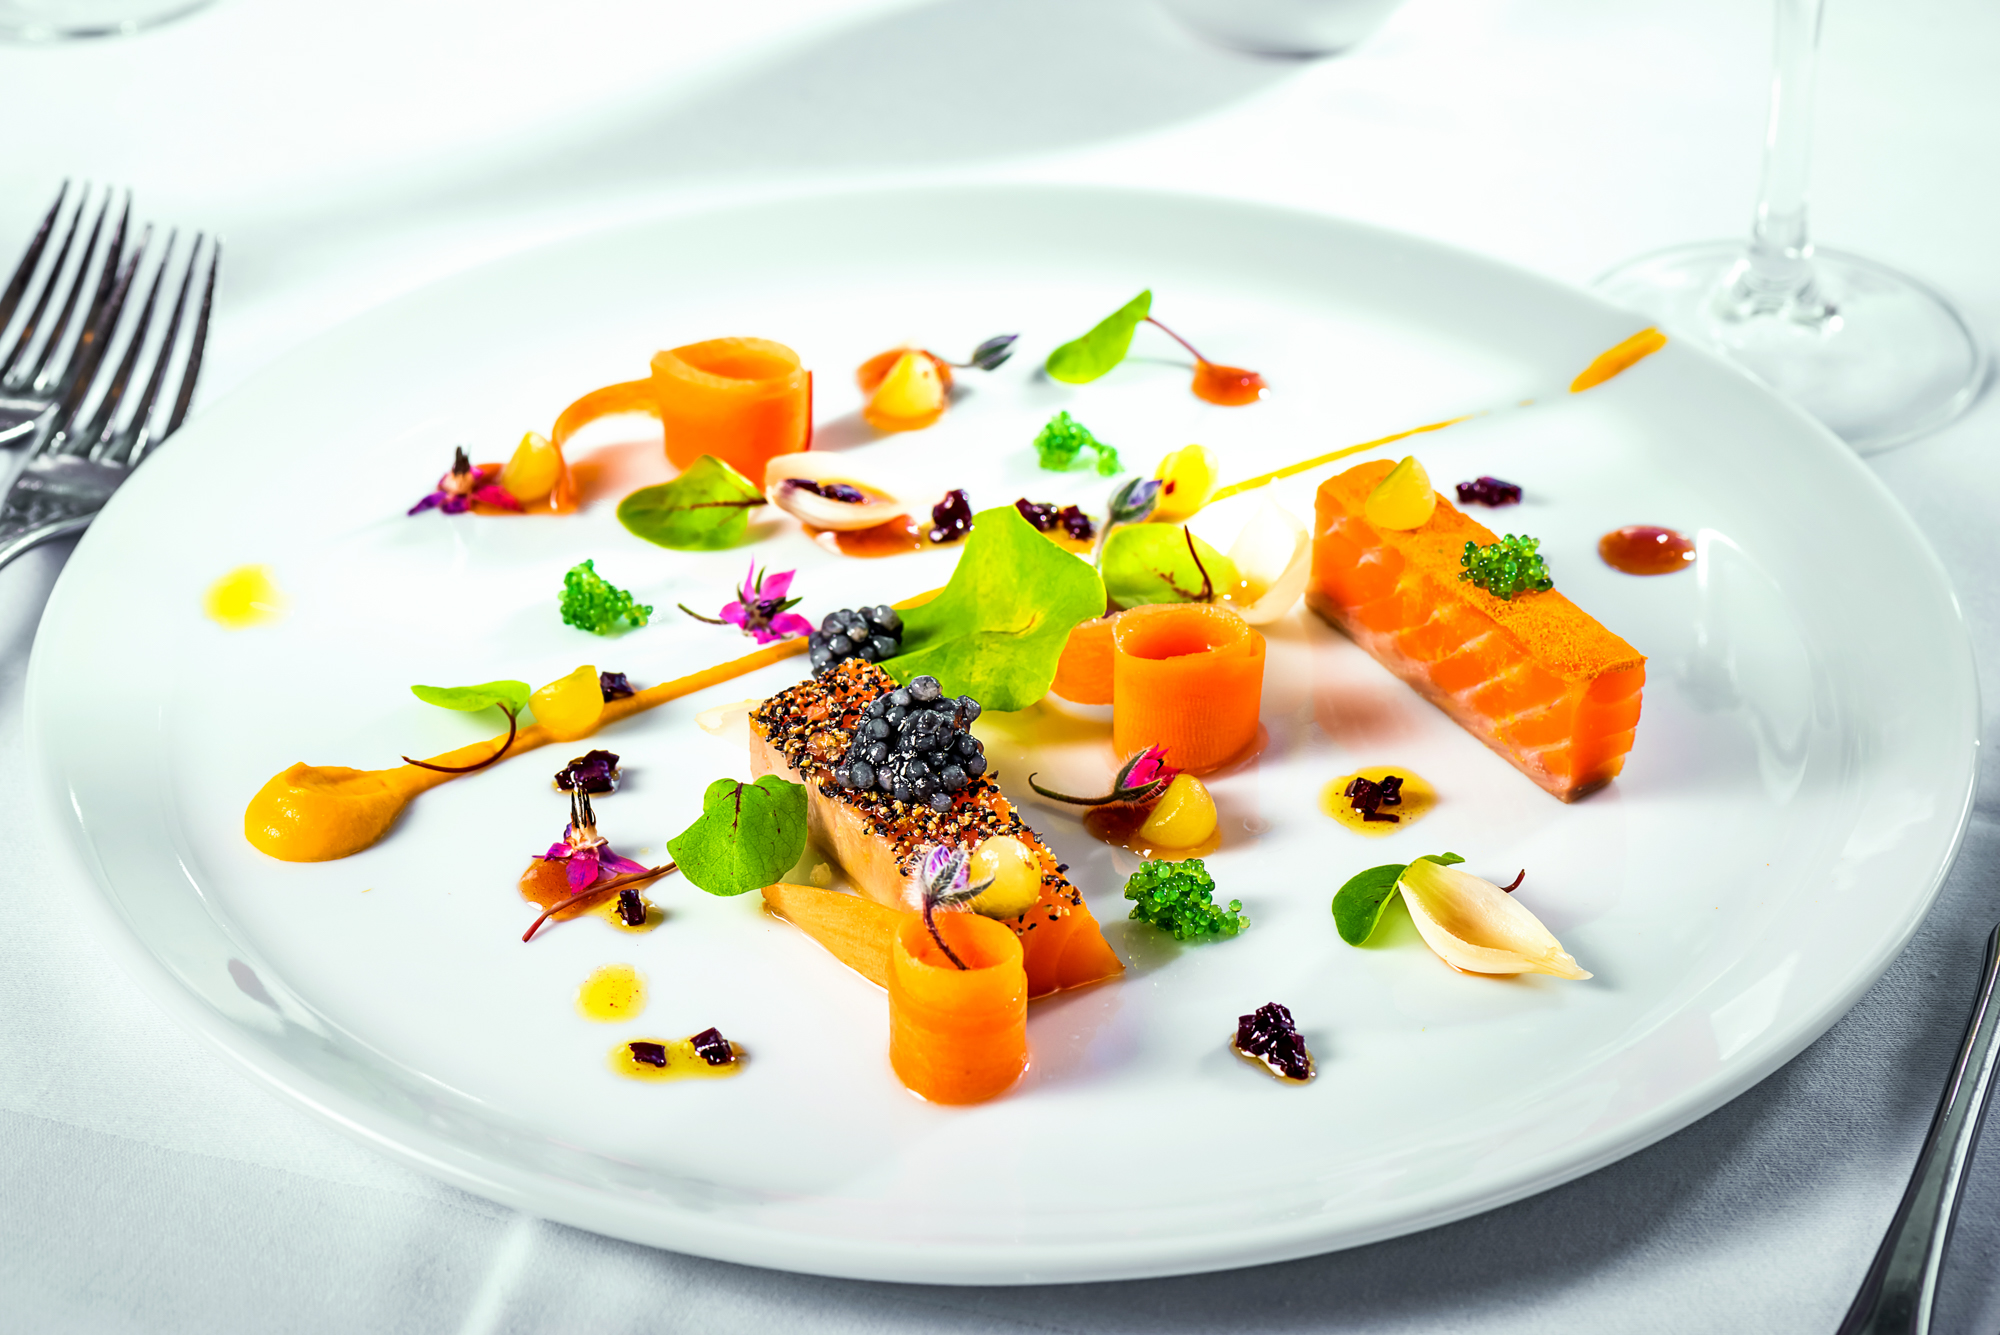 Tumeric-Cured-Salmon-Mulranny-Park-Hotel-Food-Photography-1.jpg